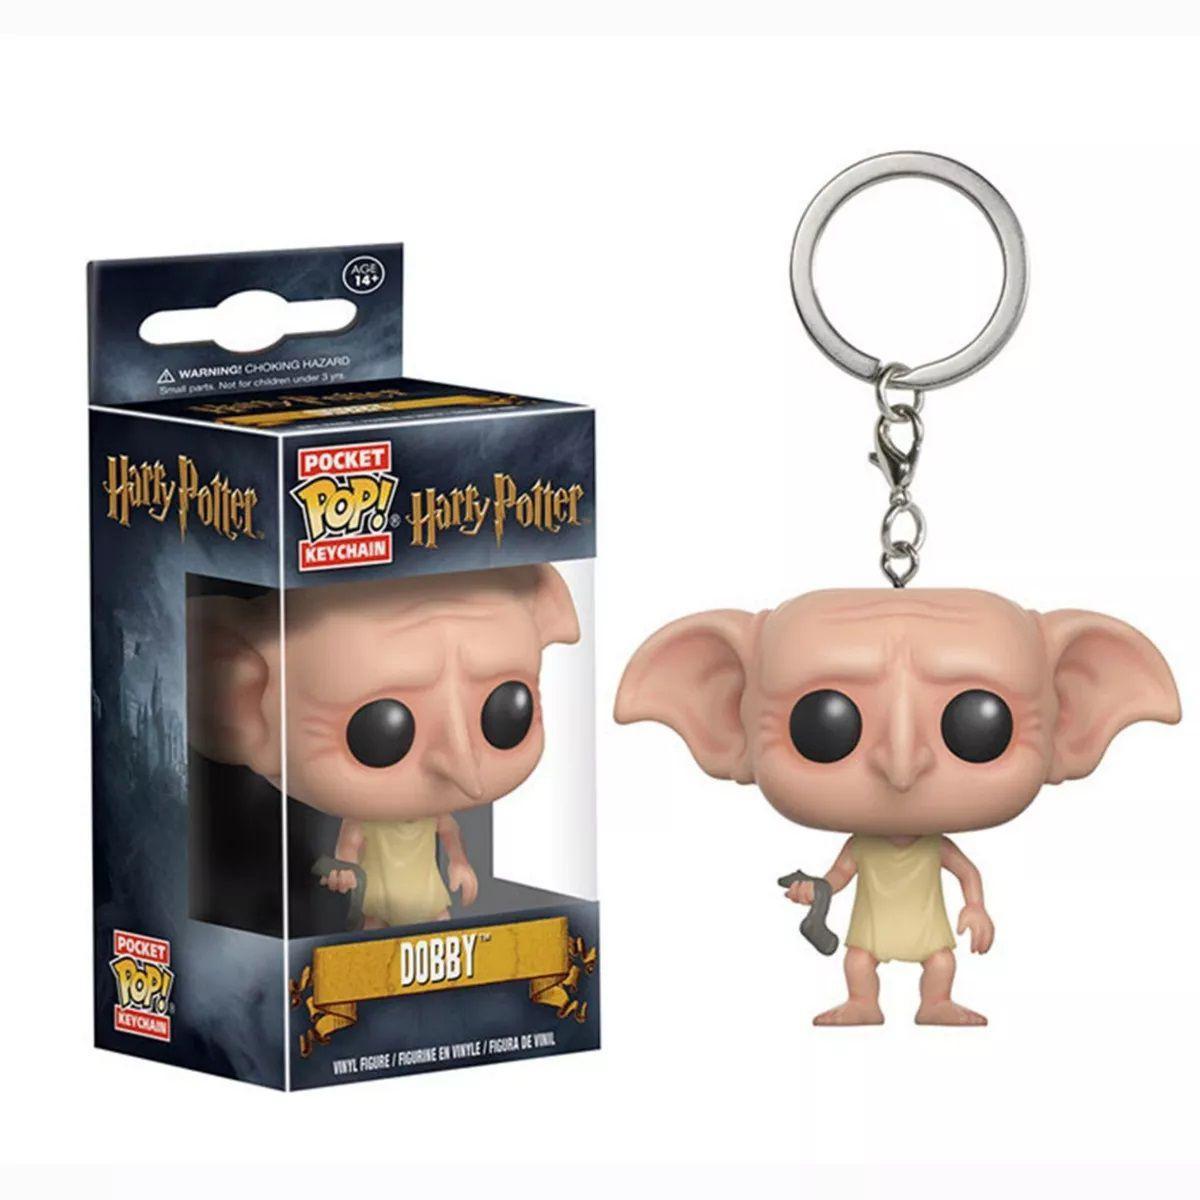 Chaveiro Funko Pop Keychain Harry Potter - Dobby